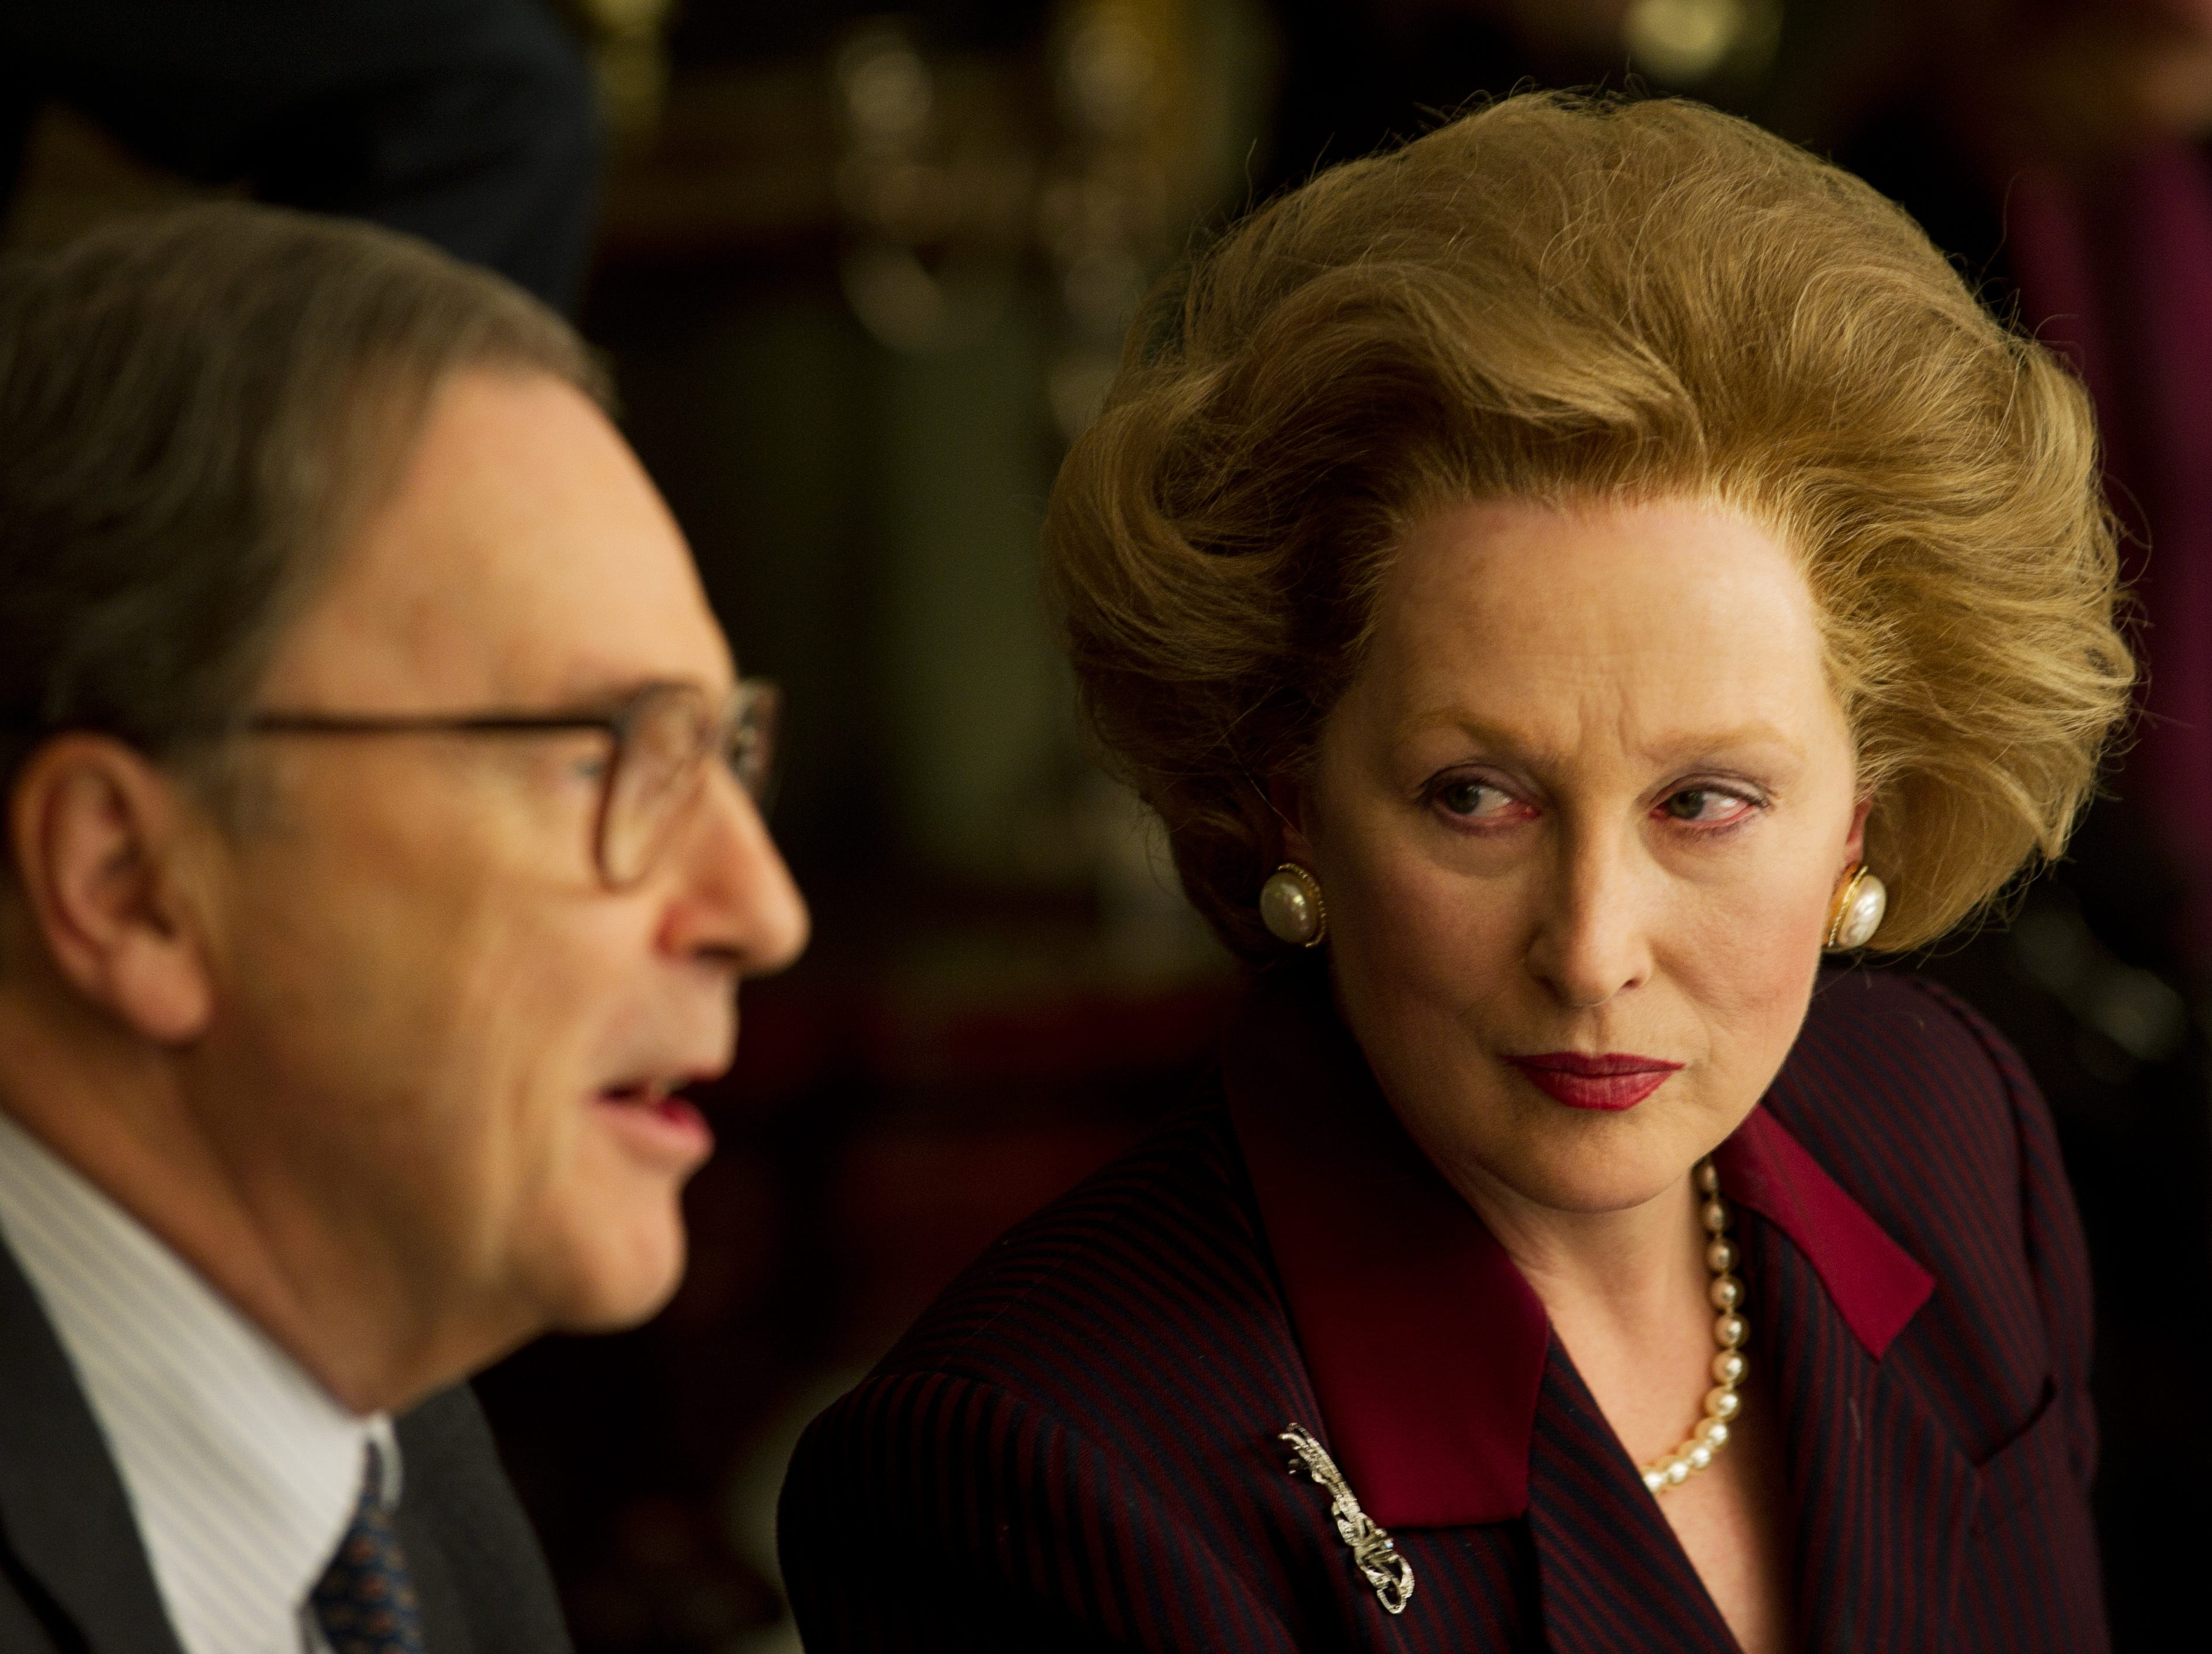 Meryl Streep stars in 'The Iron Lady.'